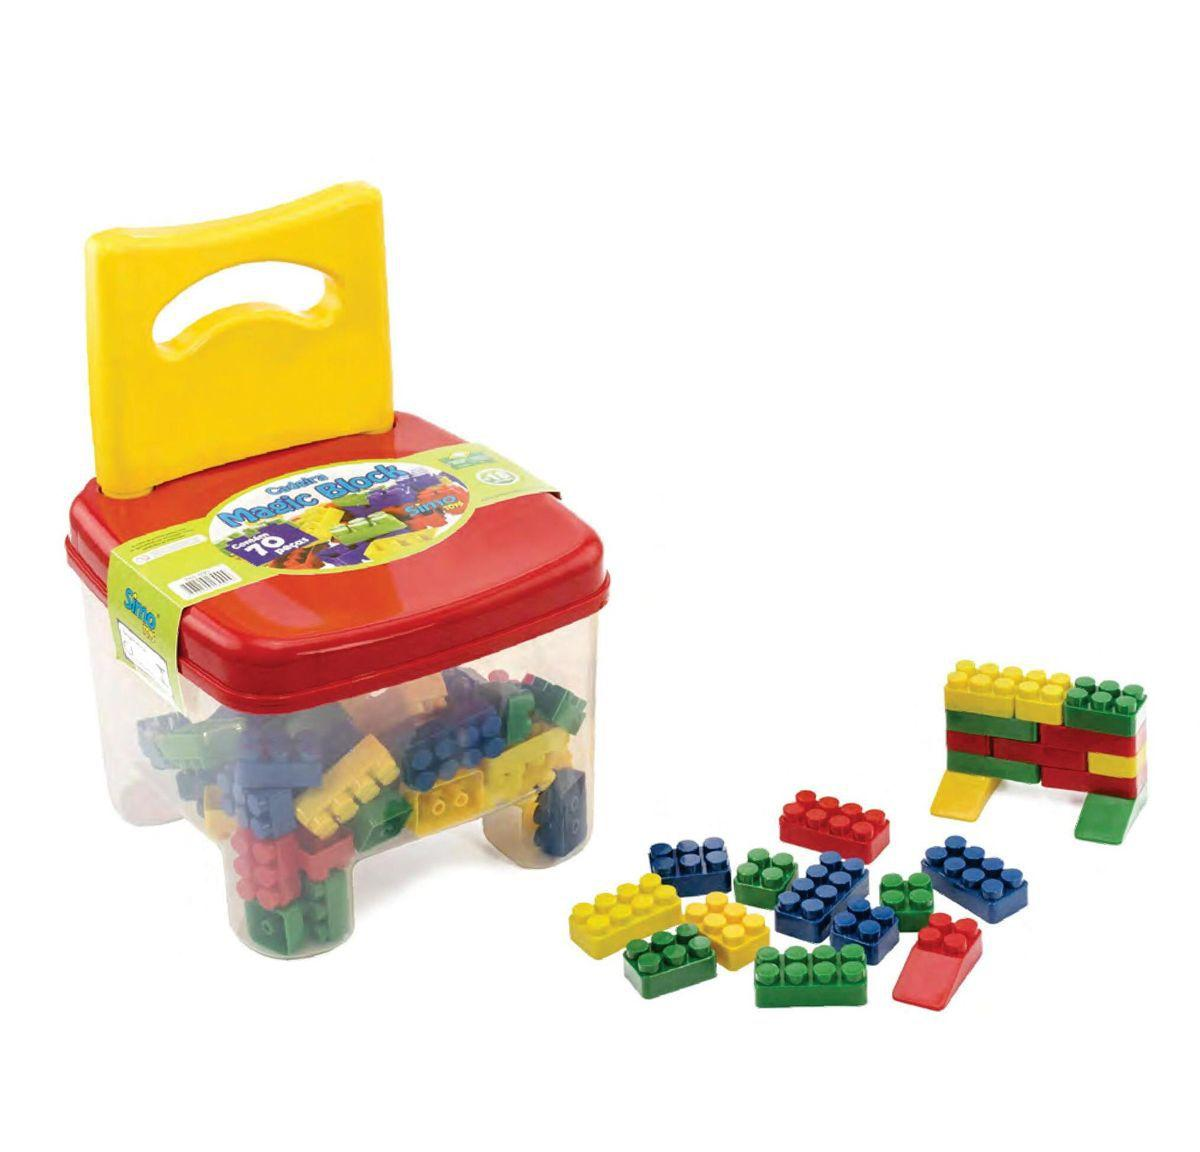 Cadeira Infantil Magic Block SimoToys 70 Peças